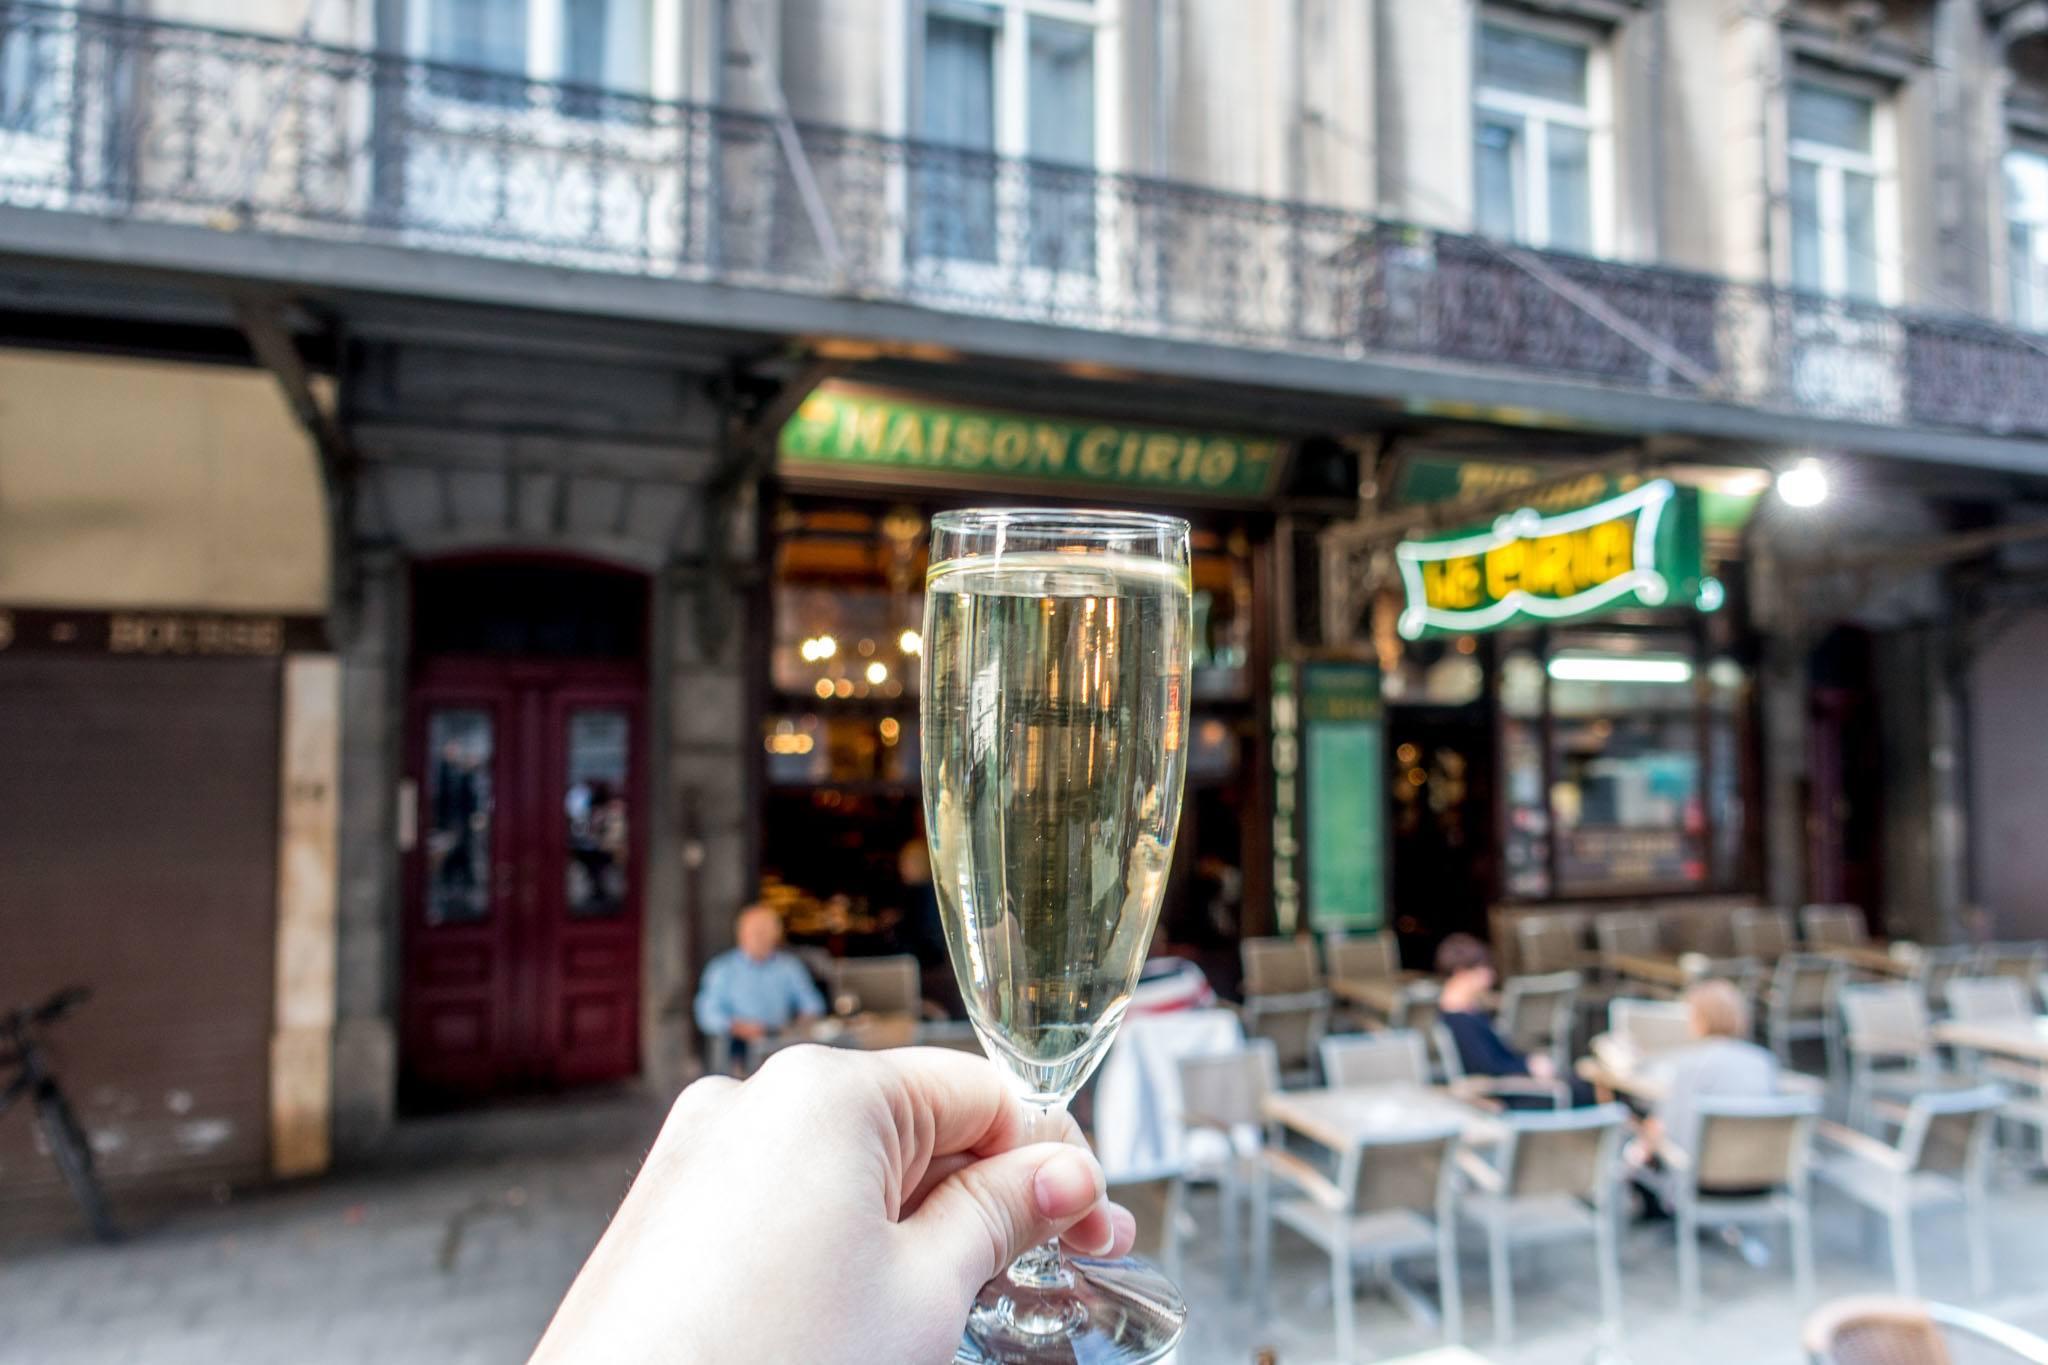 Glass of half-en-half cocktail at Le Cirio outdoor cafe